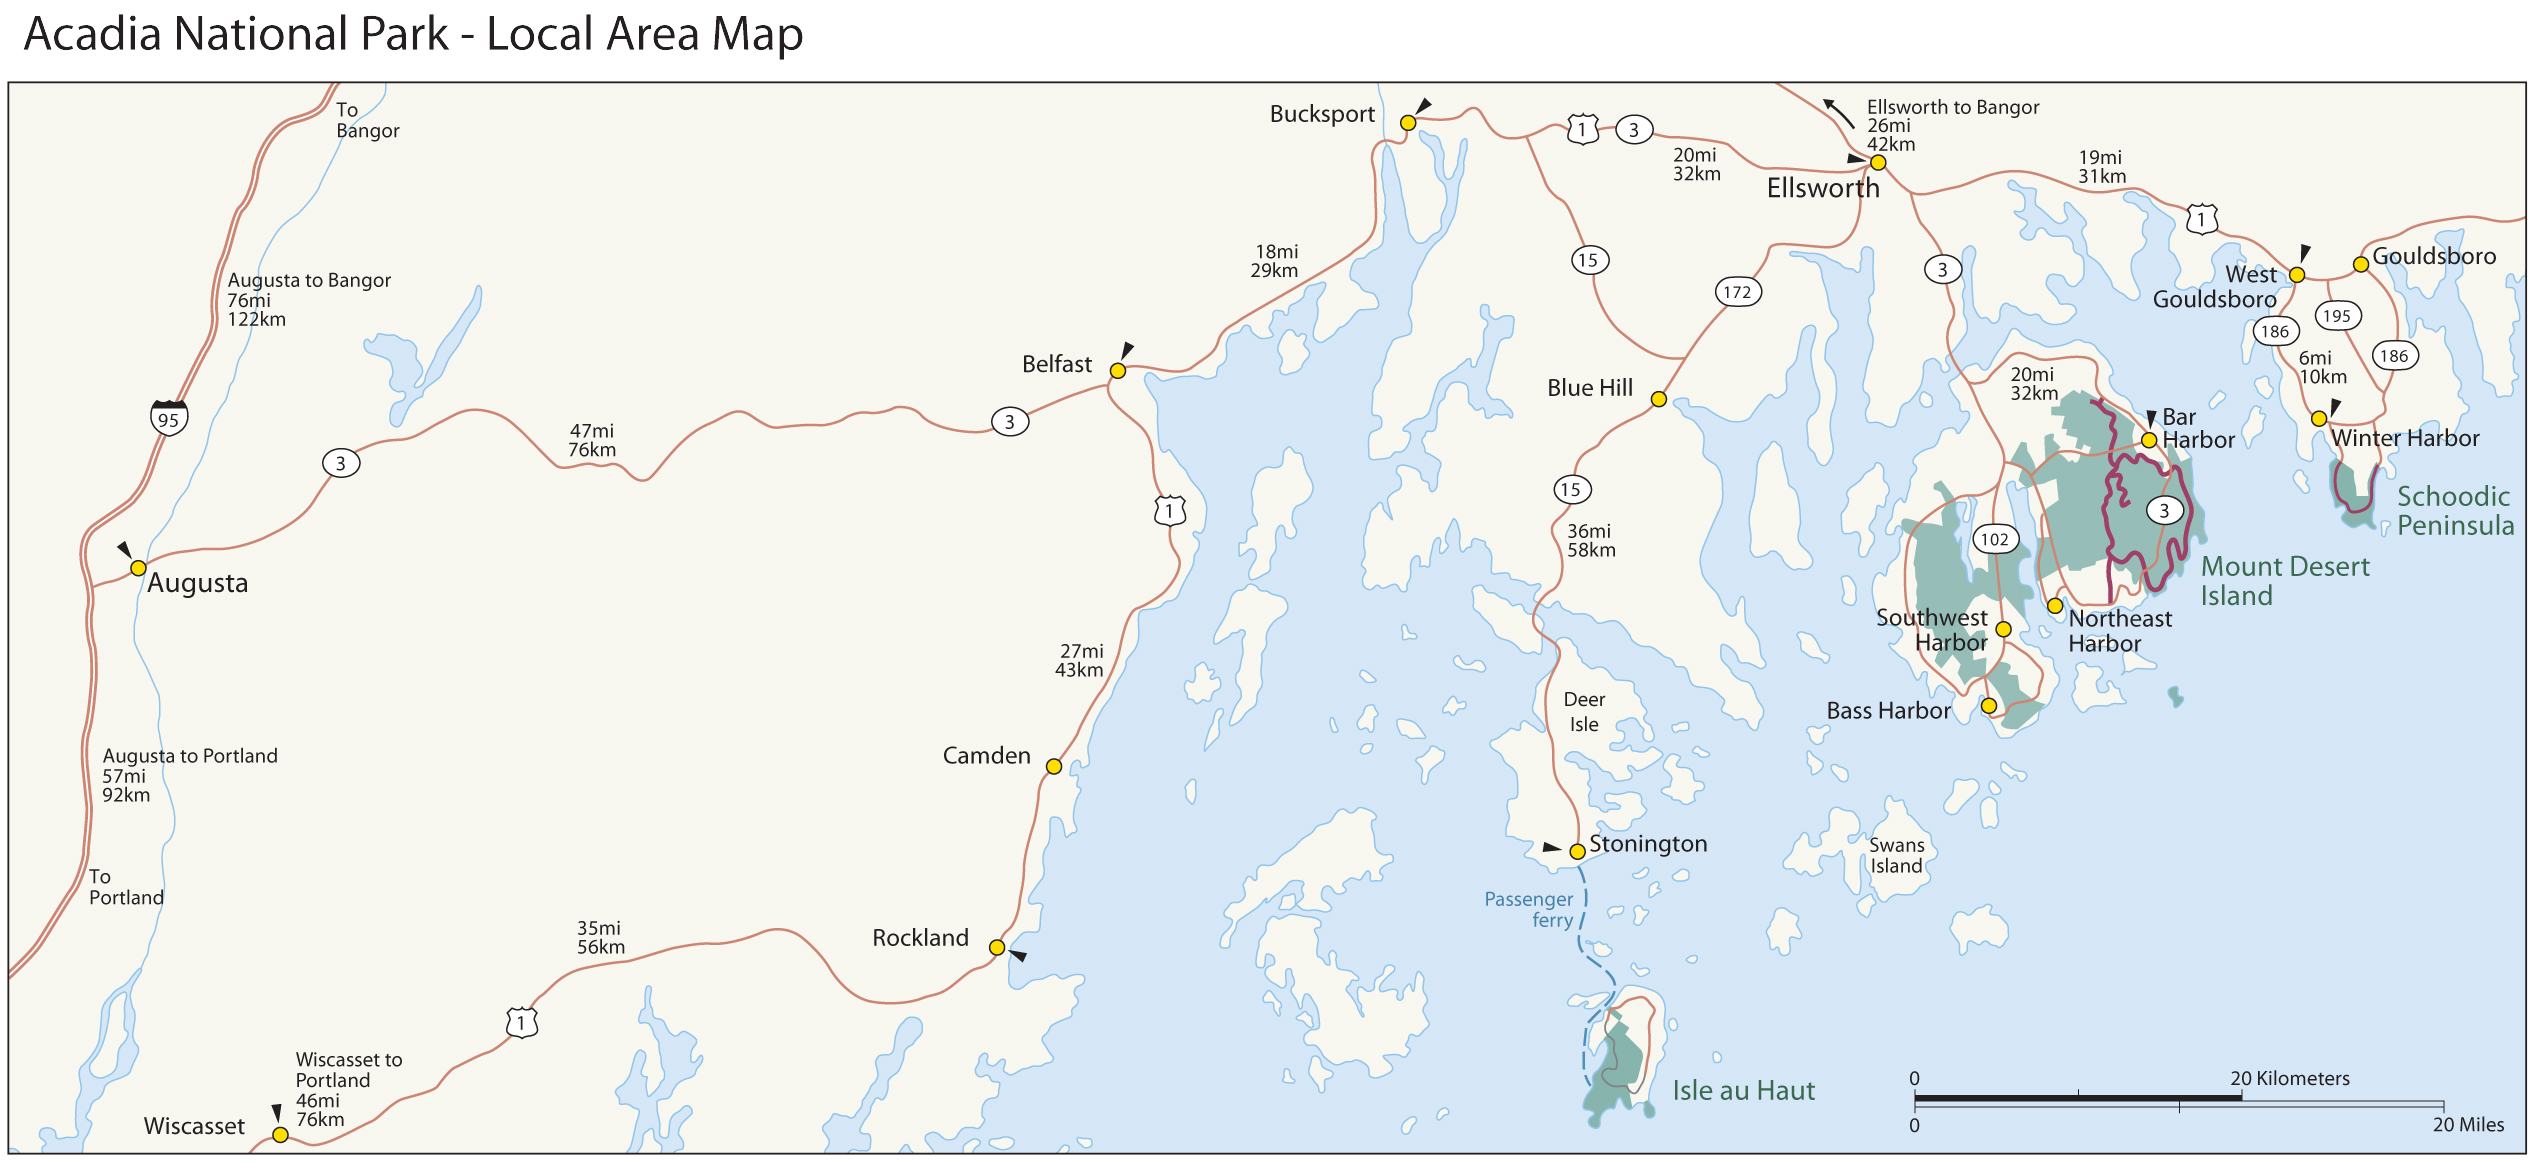 Maps - Acadia National Park (U.S. National Park Service)